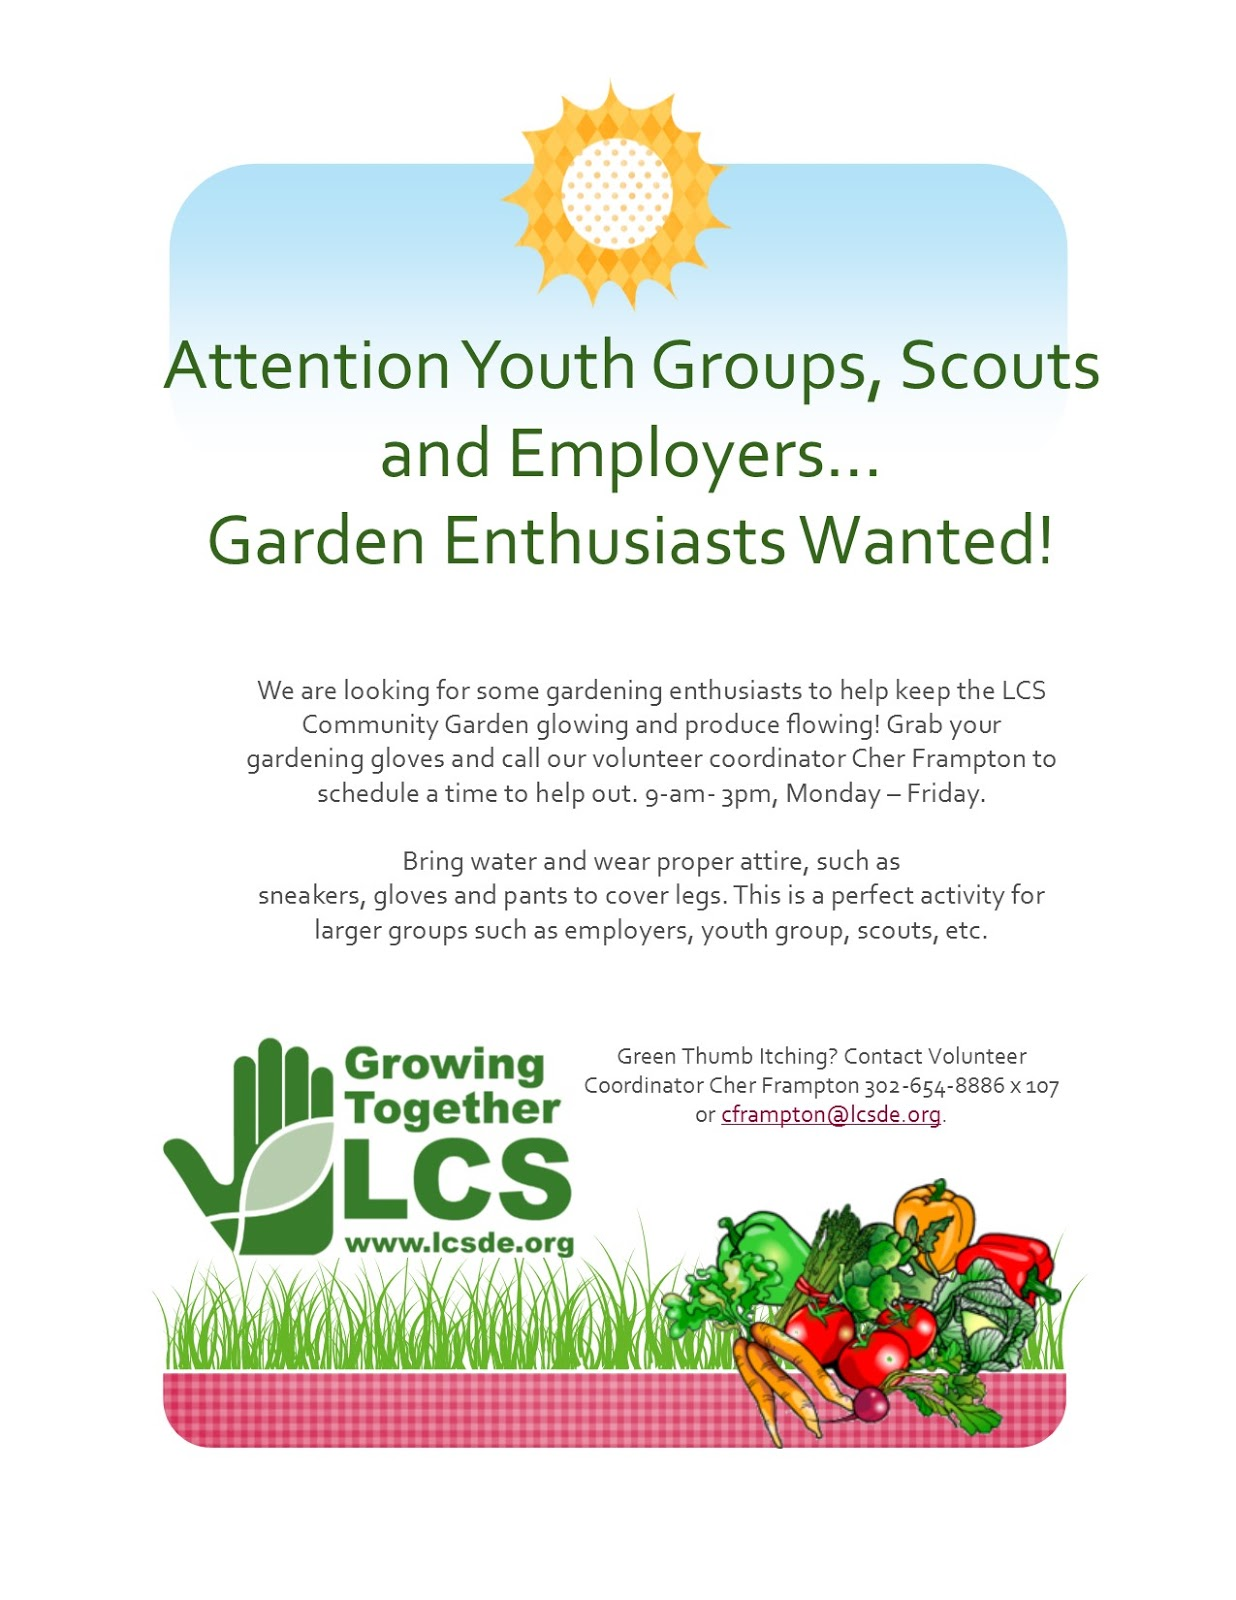 LCS Volunteers